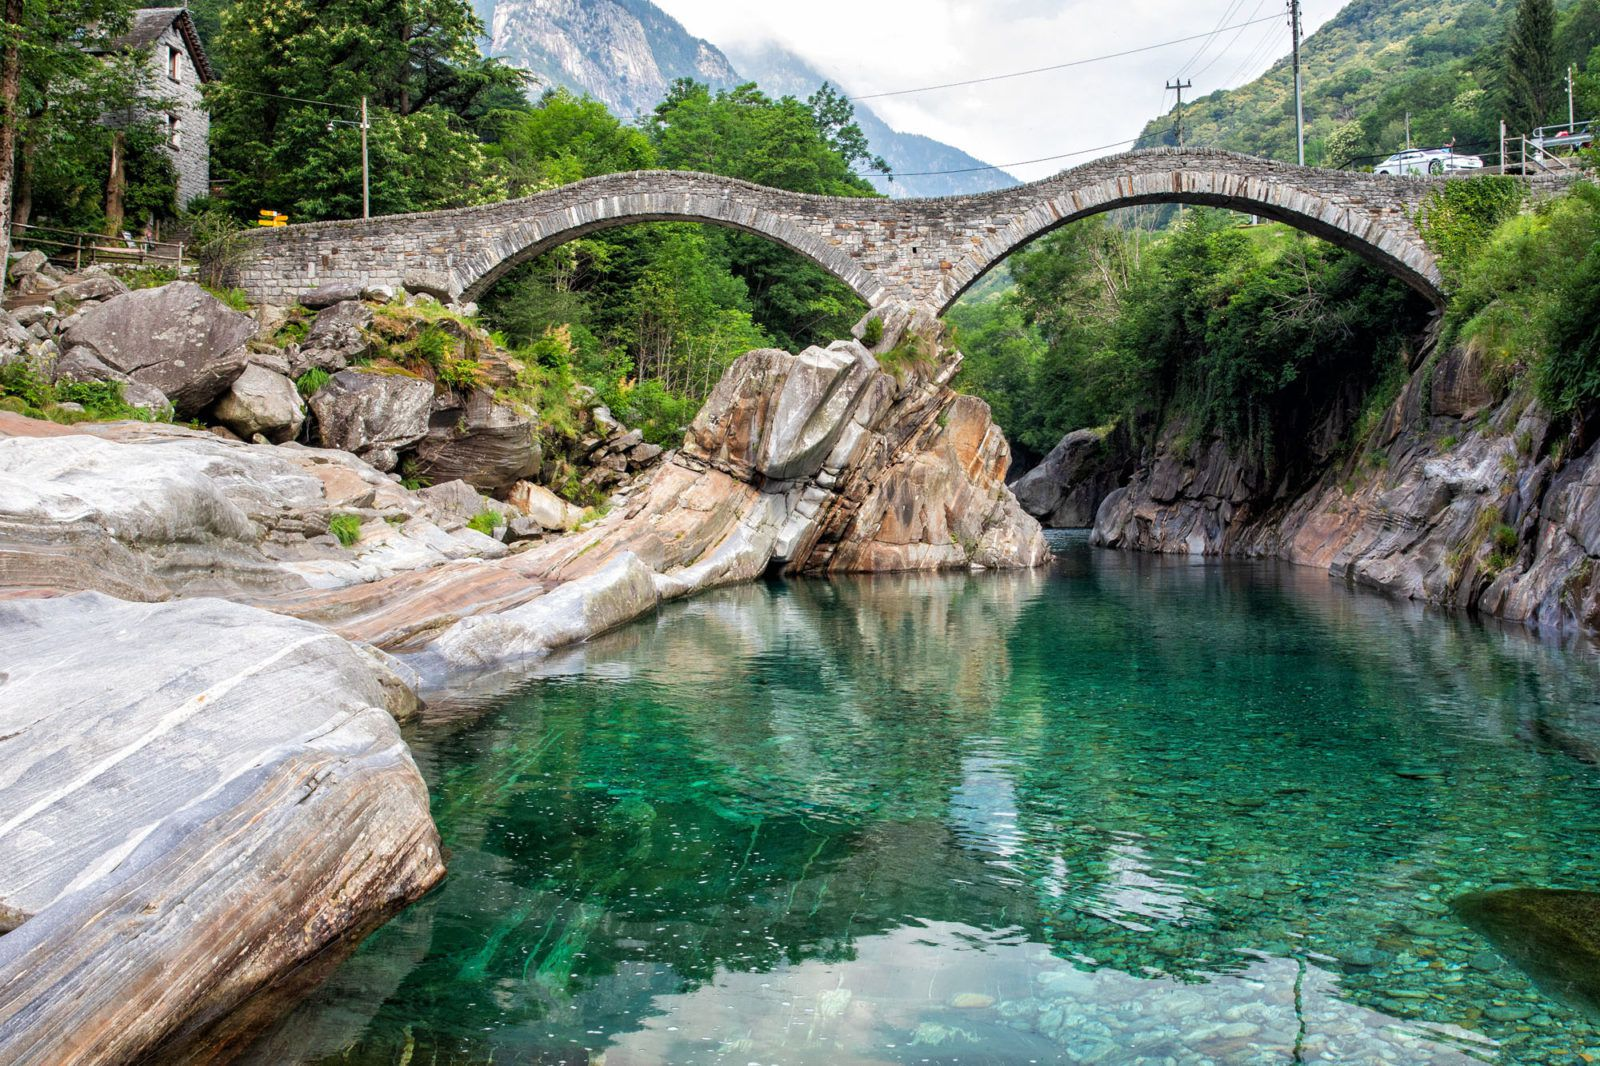 How to Visit Ponte dei Salti Bridge